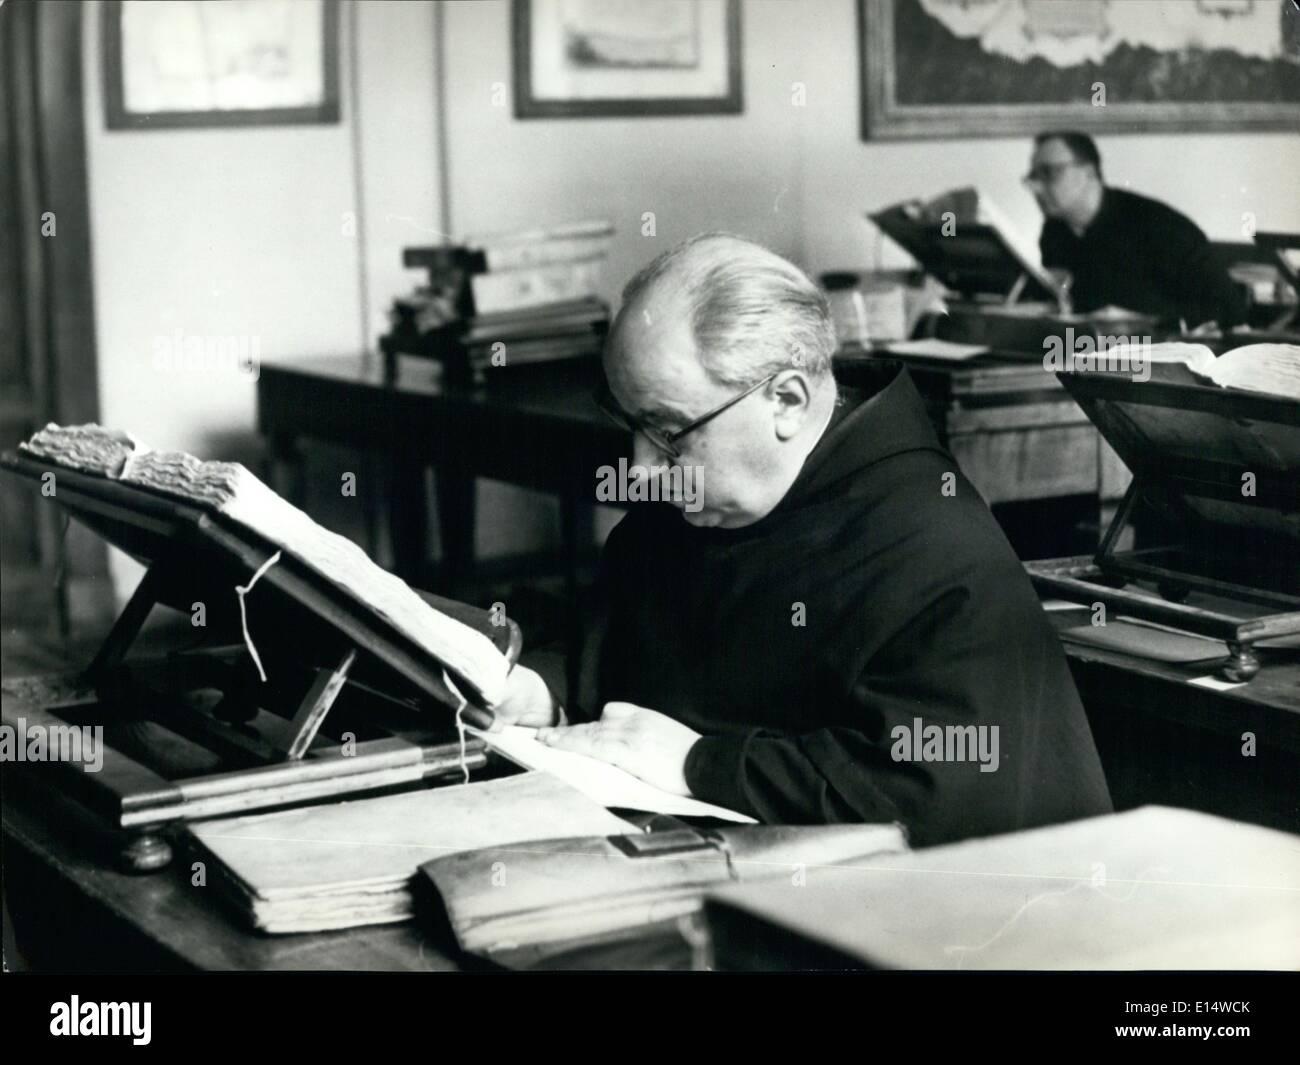 Abril 18, 2012 - sala de lectura del Archivo Secreto Vaticano. Imagen De Stock